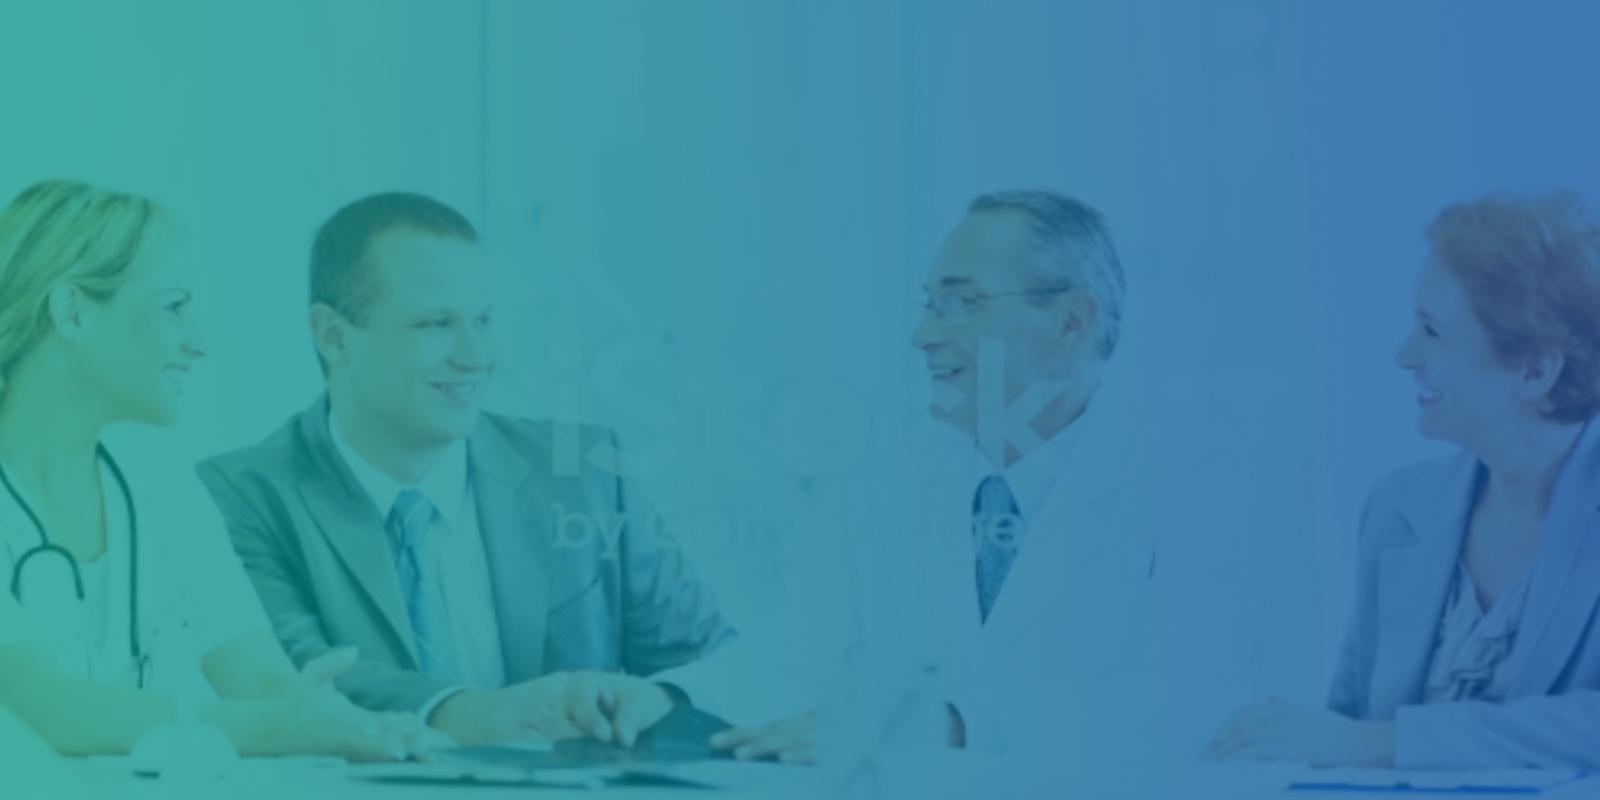 Transition Care Management (procedural process not HEDIS measure)